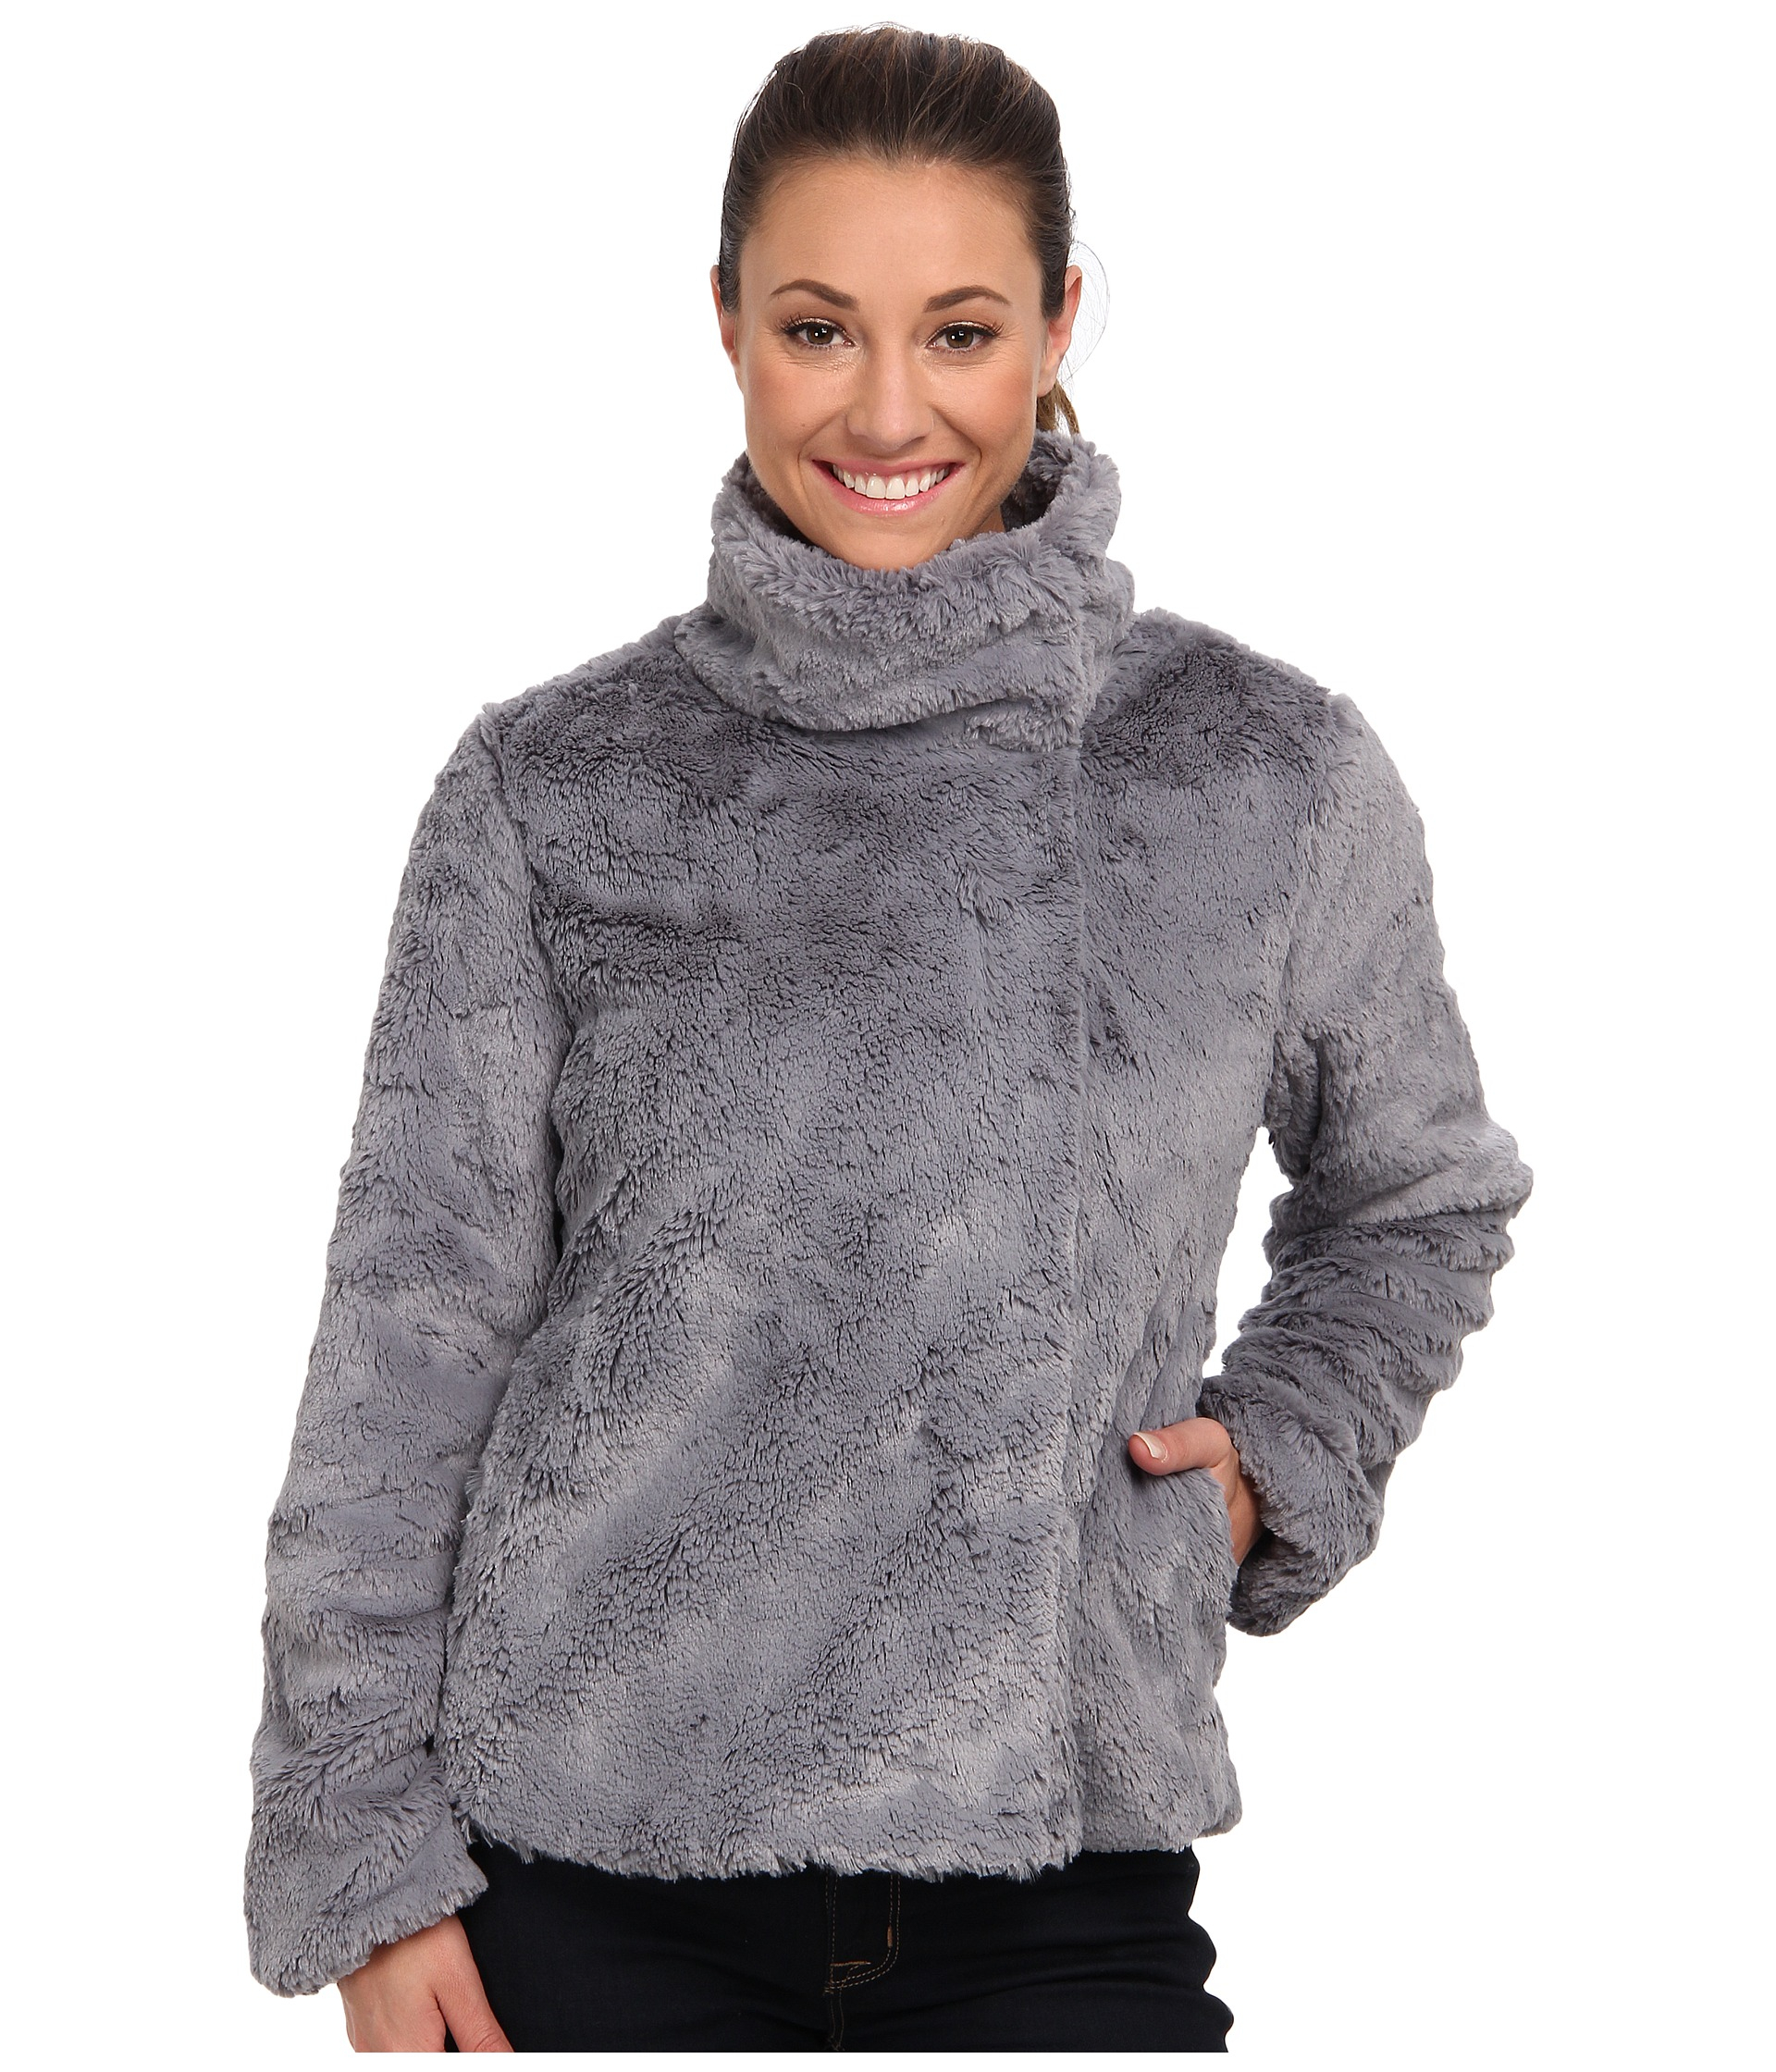 Patagonia Pelage Fleece Jacket in Gray | Lyst